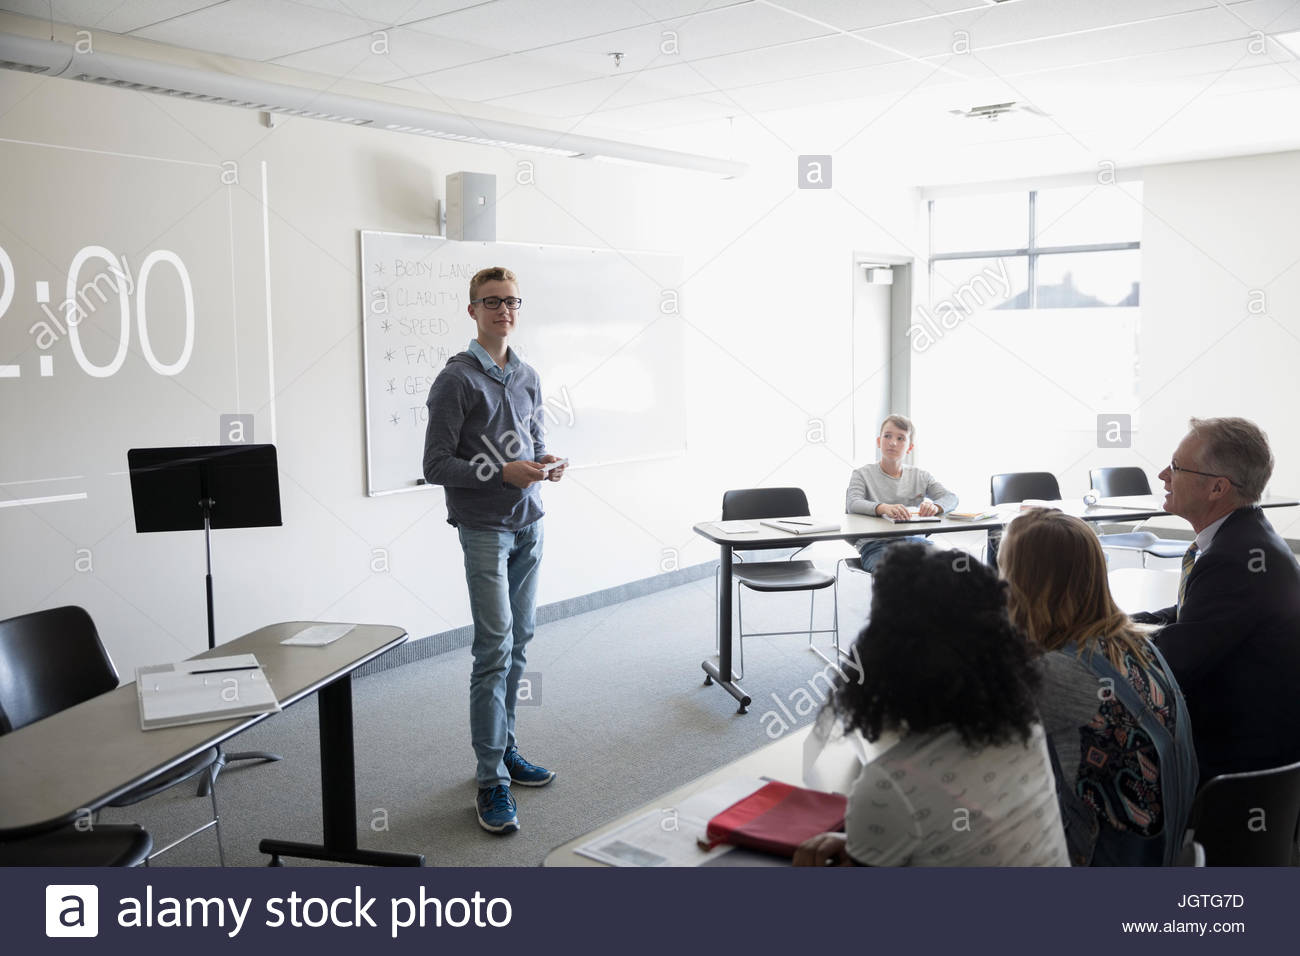 Boy middle school student speaking in debate club classroom - Stock Image